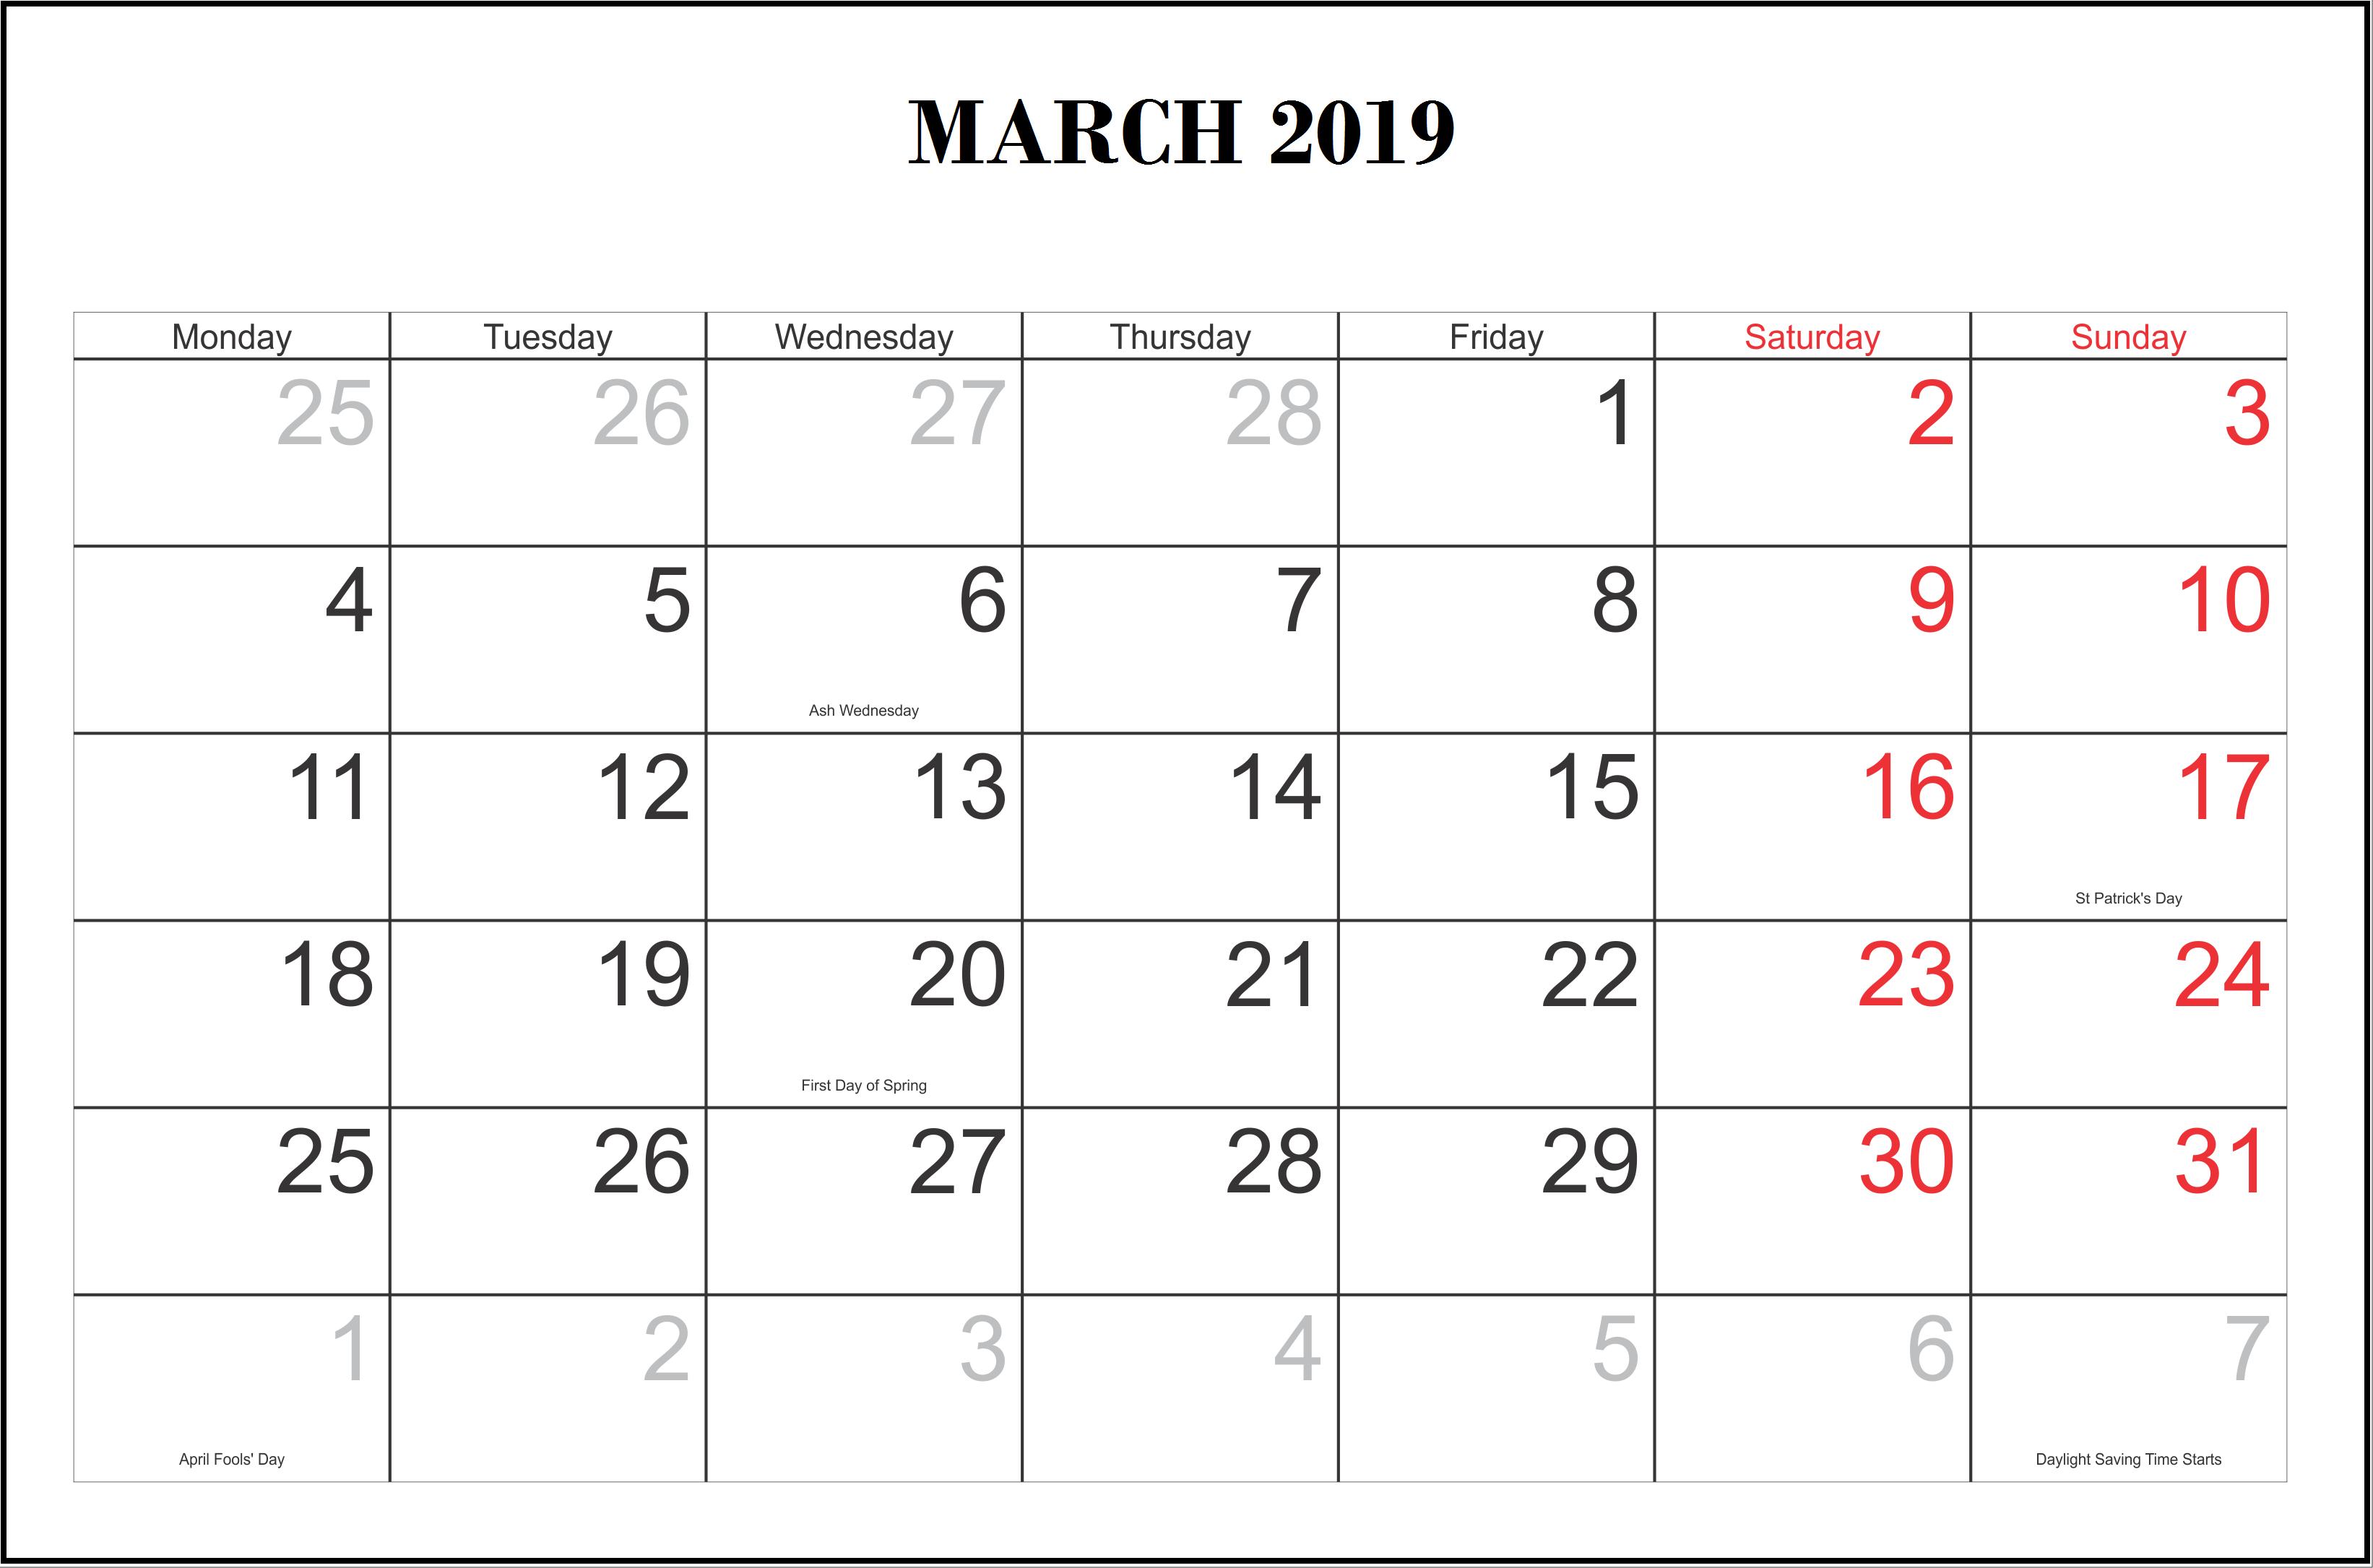 Holidays Calendar For March 2019